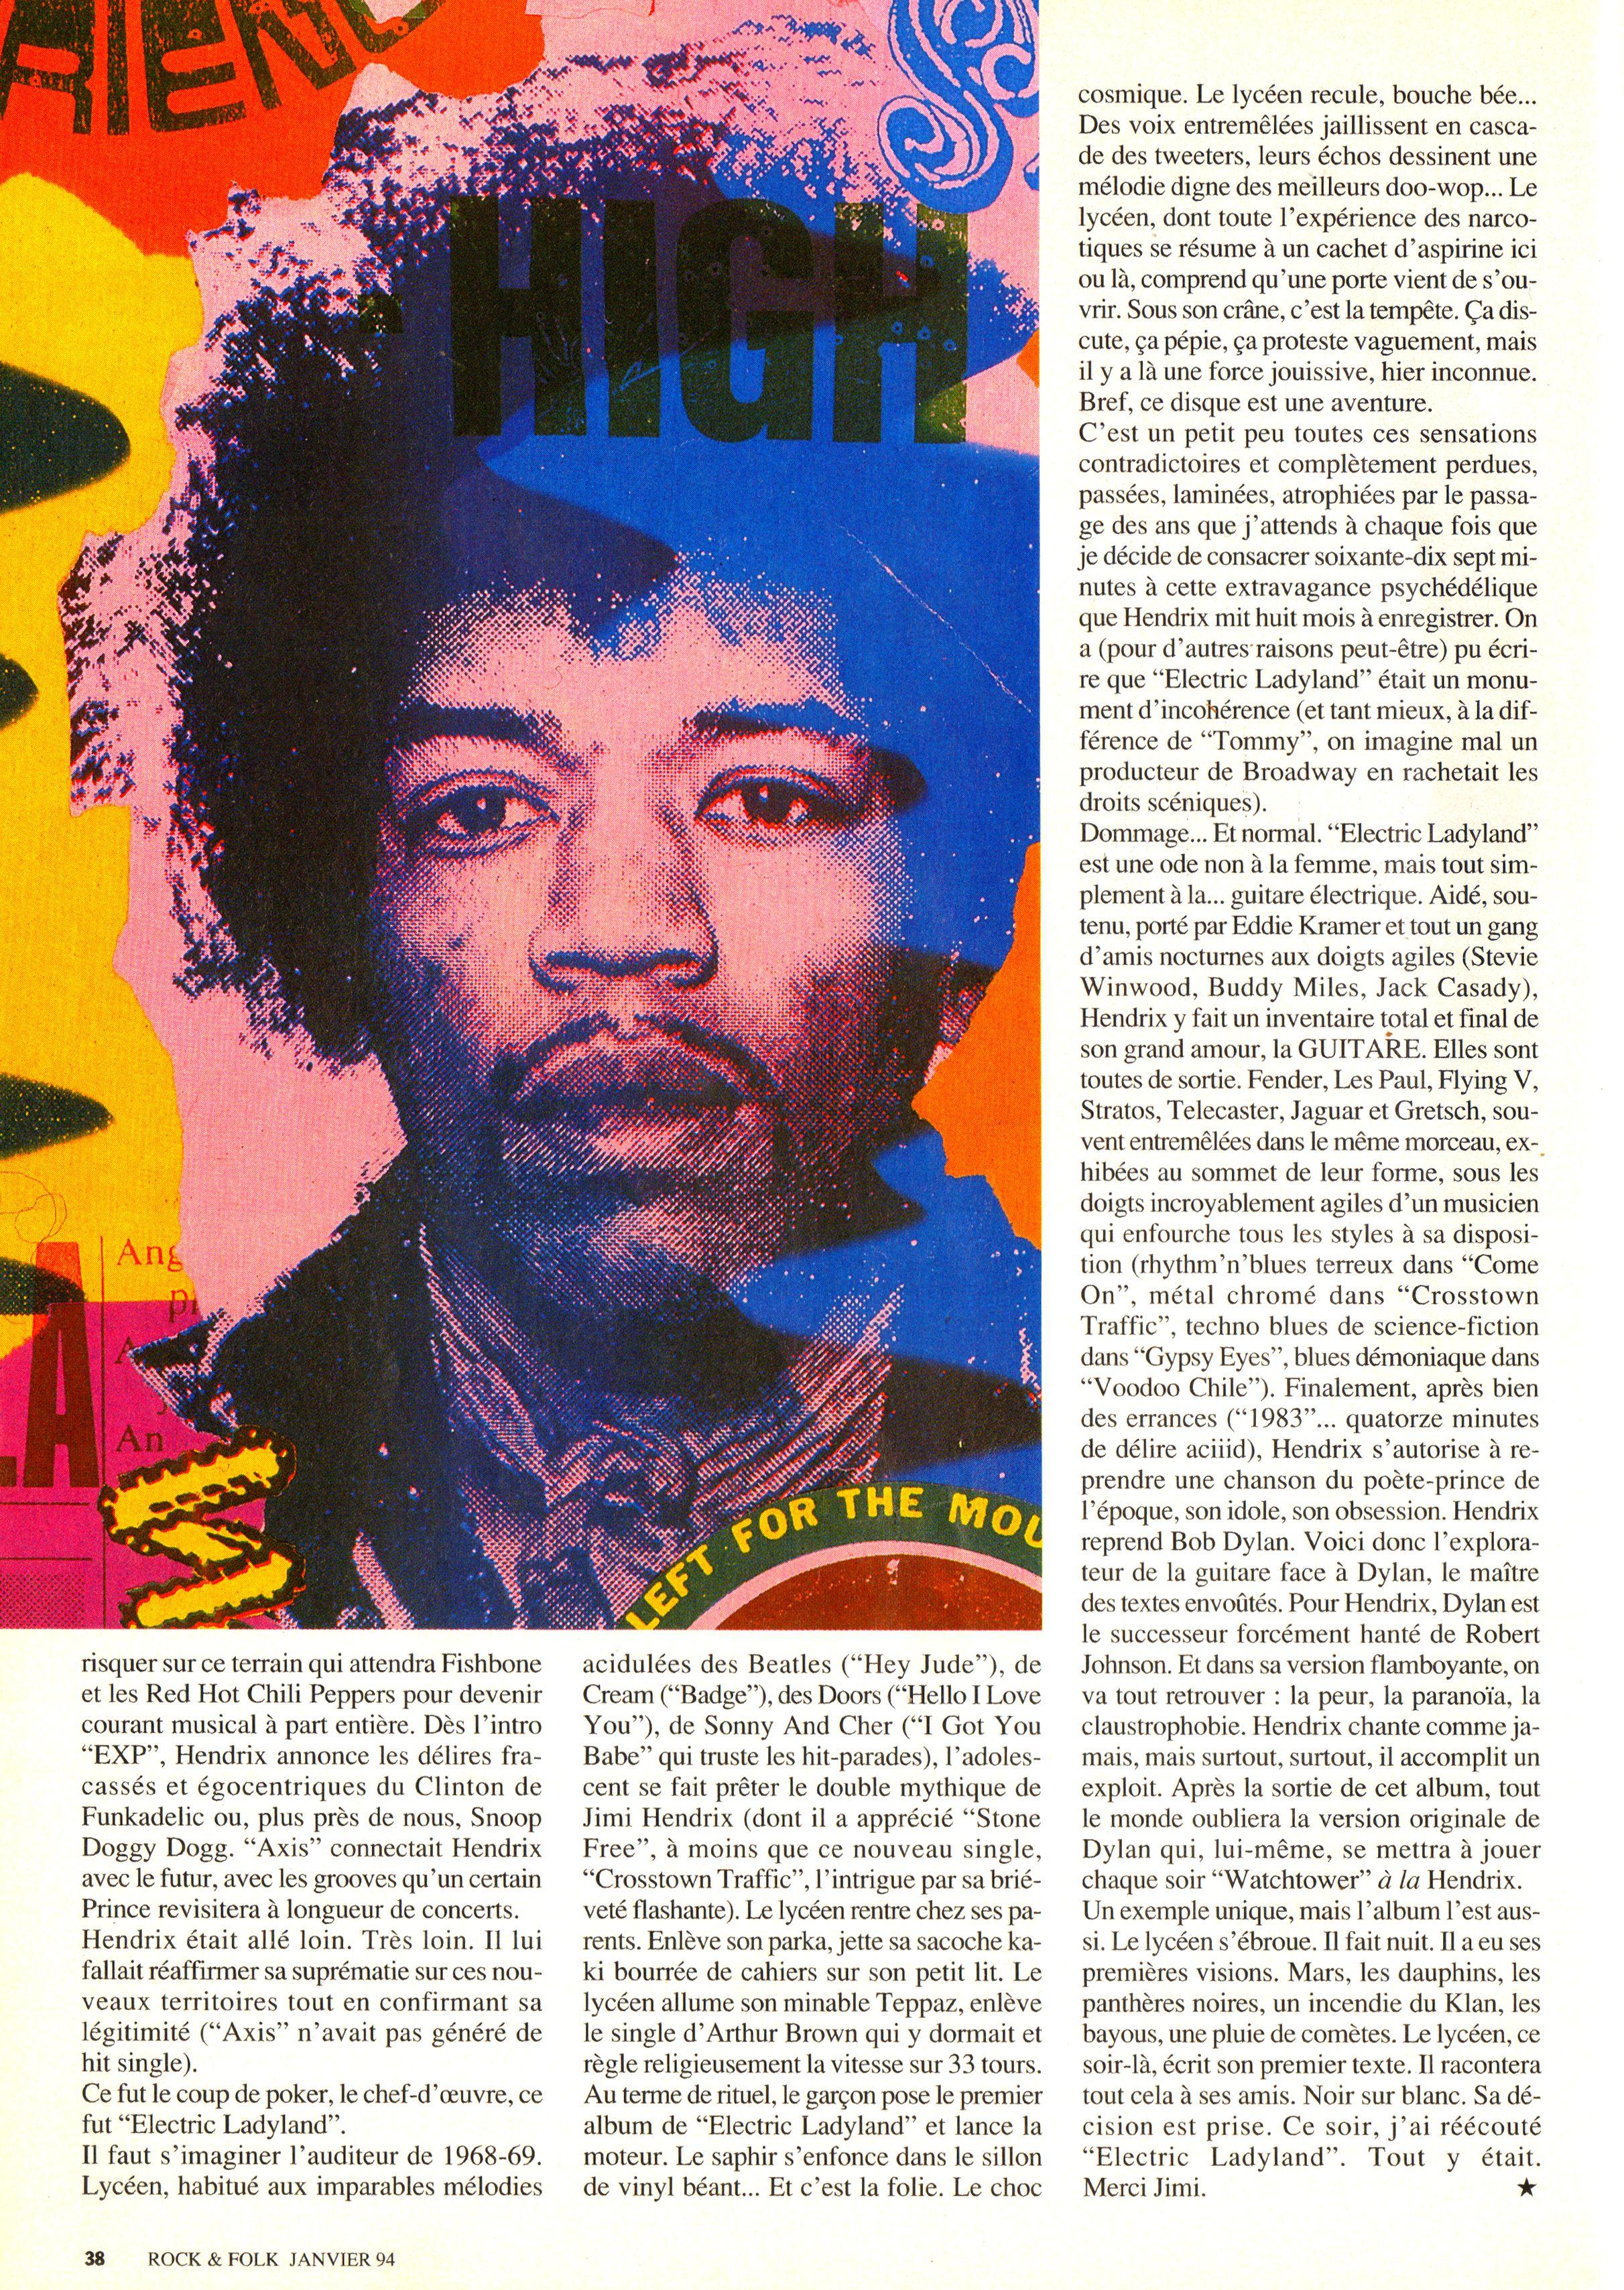 Magazines Français 1989 - 2014 RocketFolkJanvier1994Page38